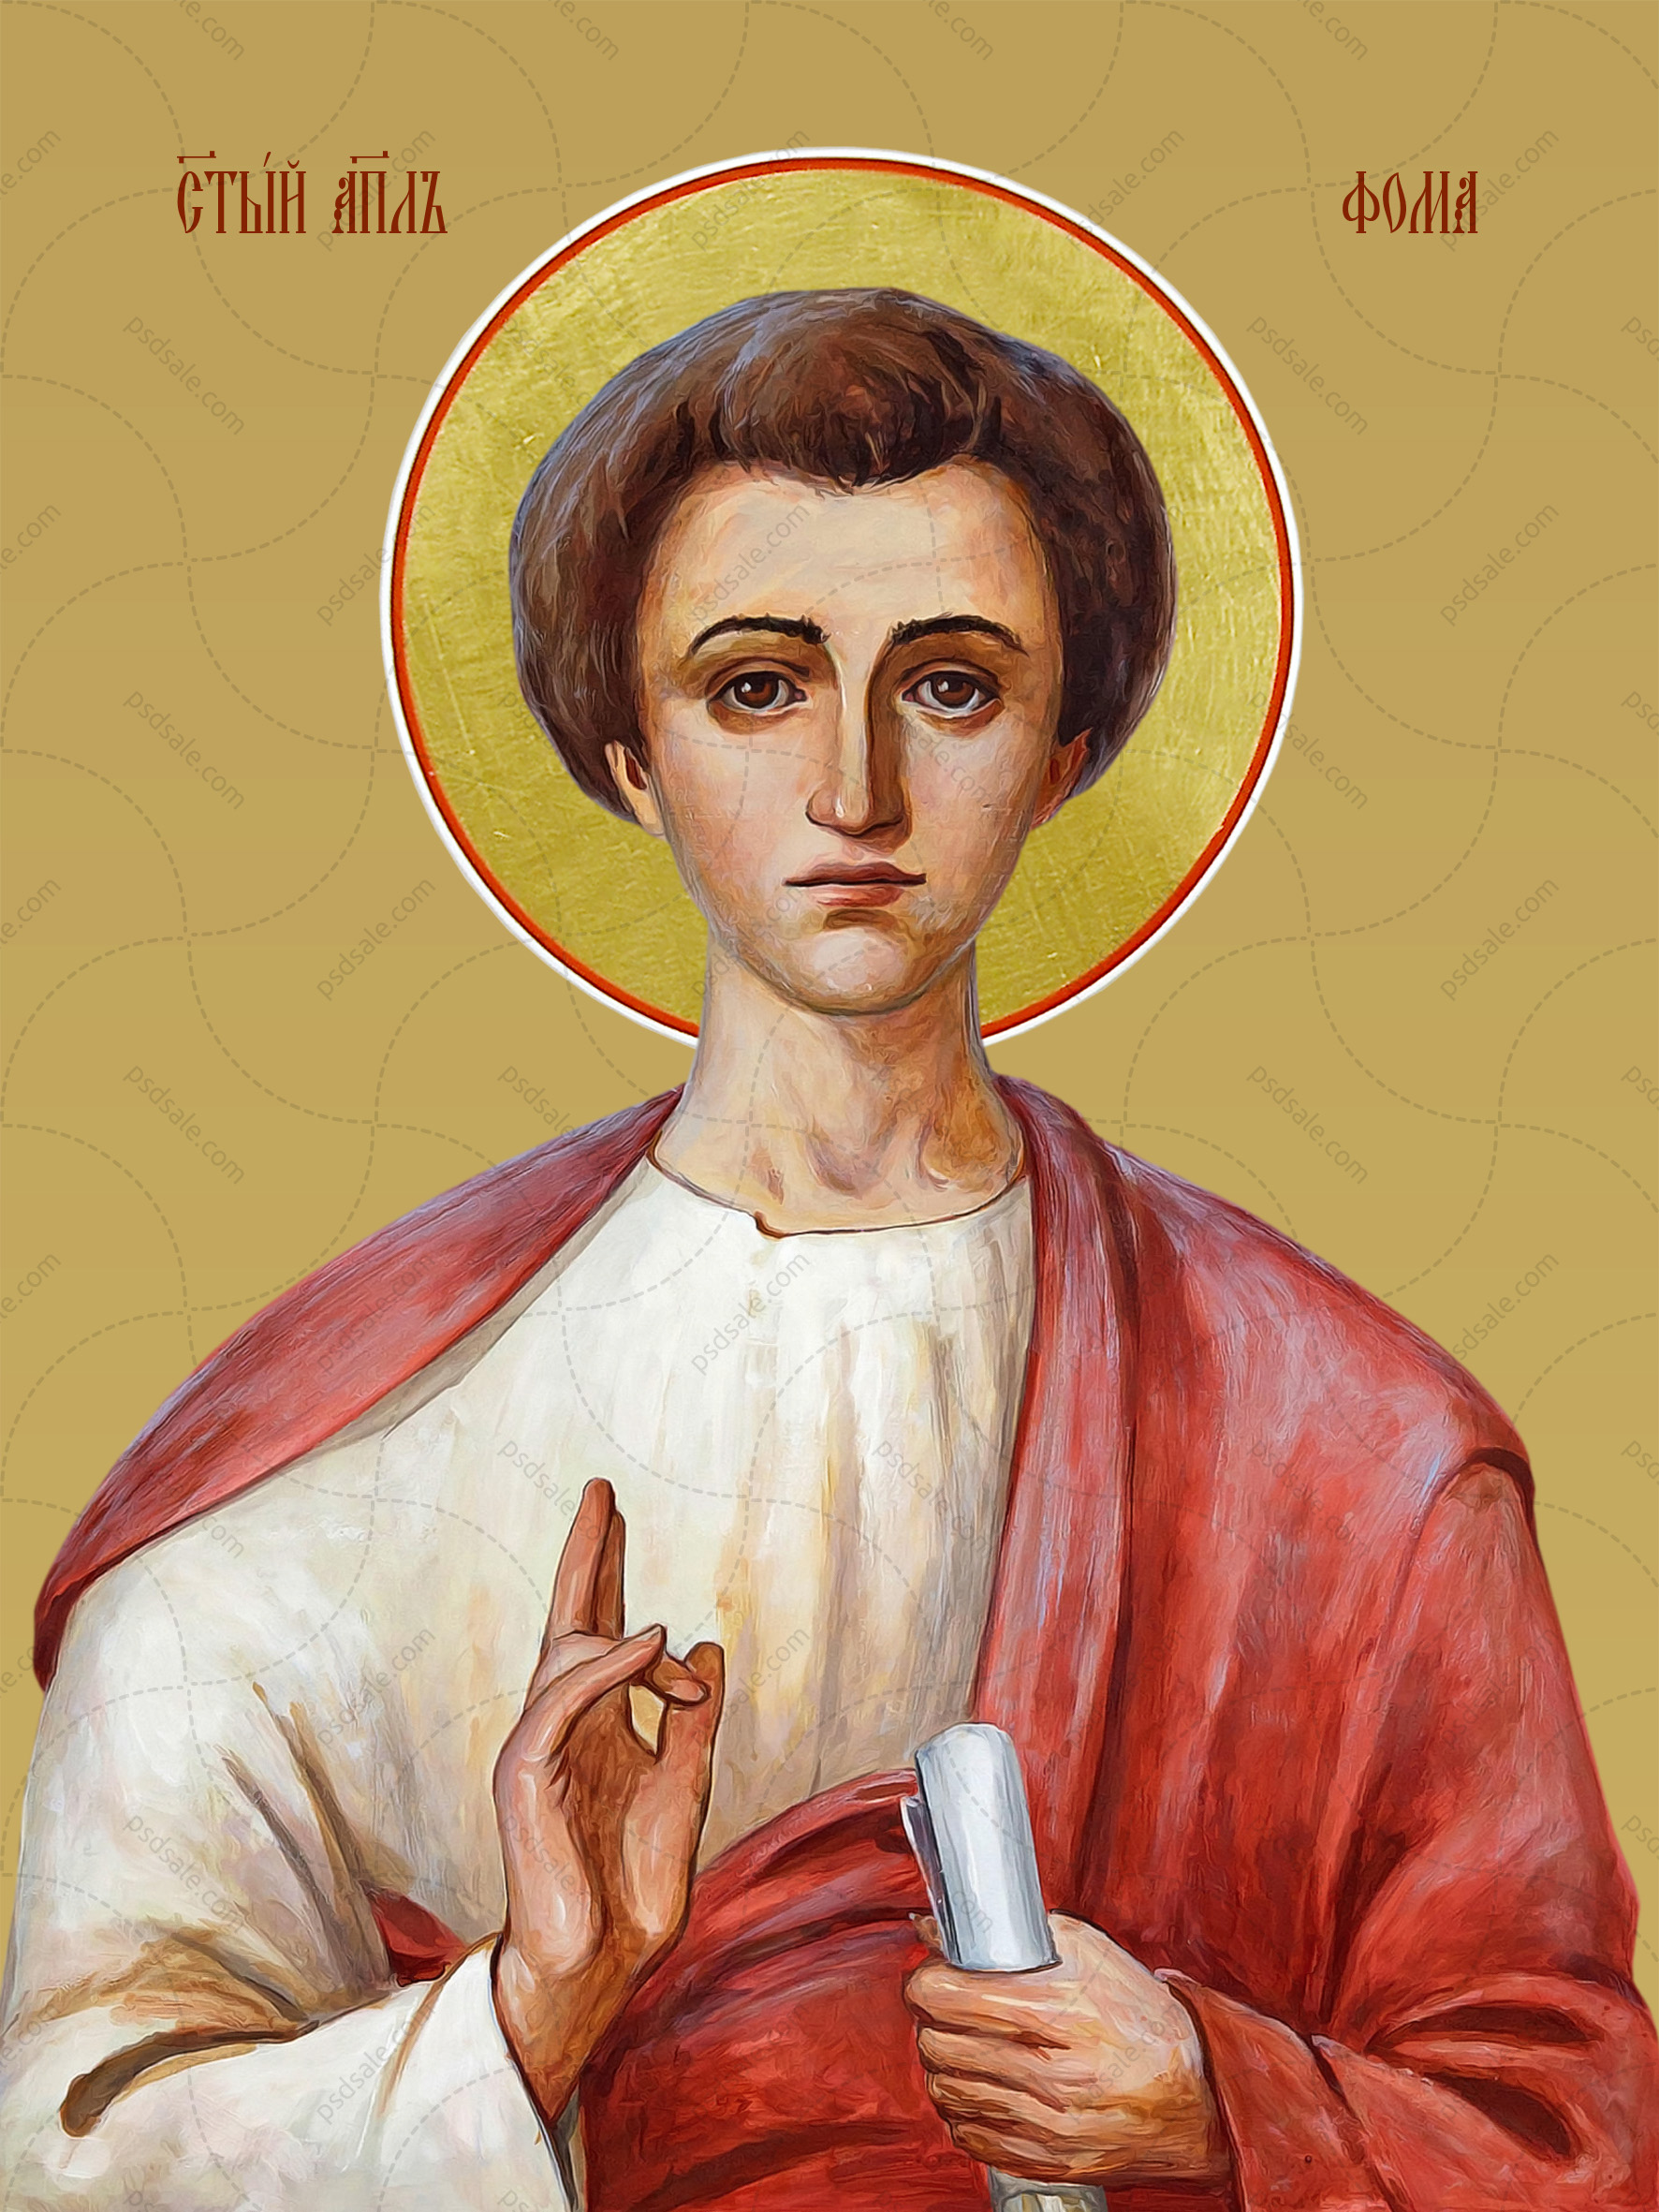 Фома, святой апостол